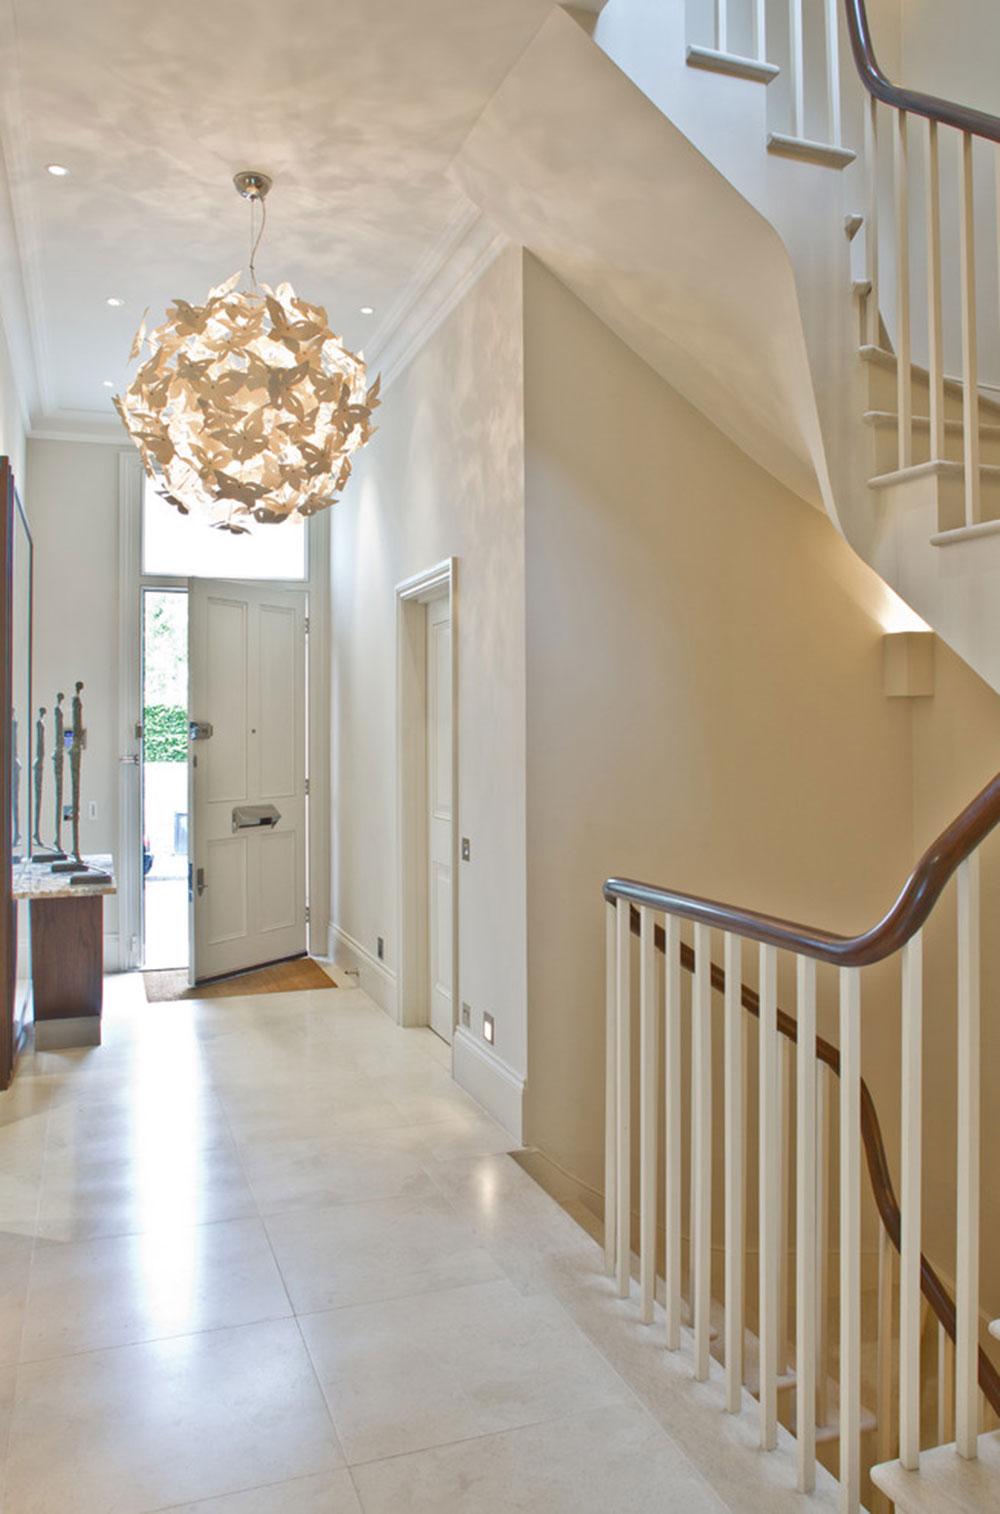 Interior-lighting-design-for-houses-15 Interior-lighting design for houses